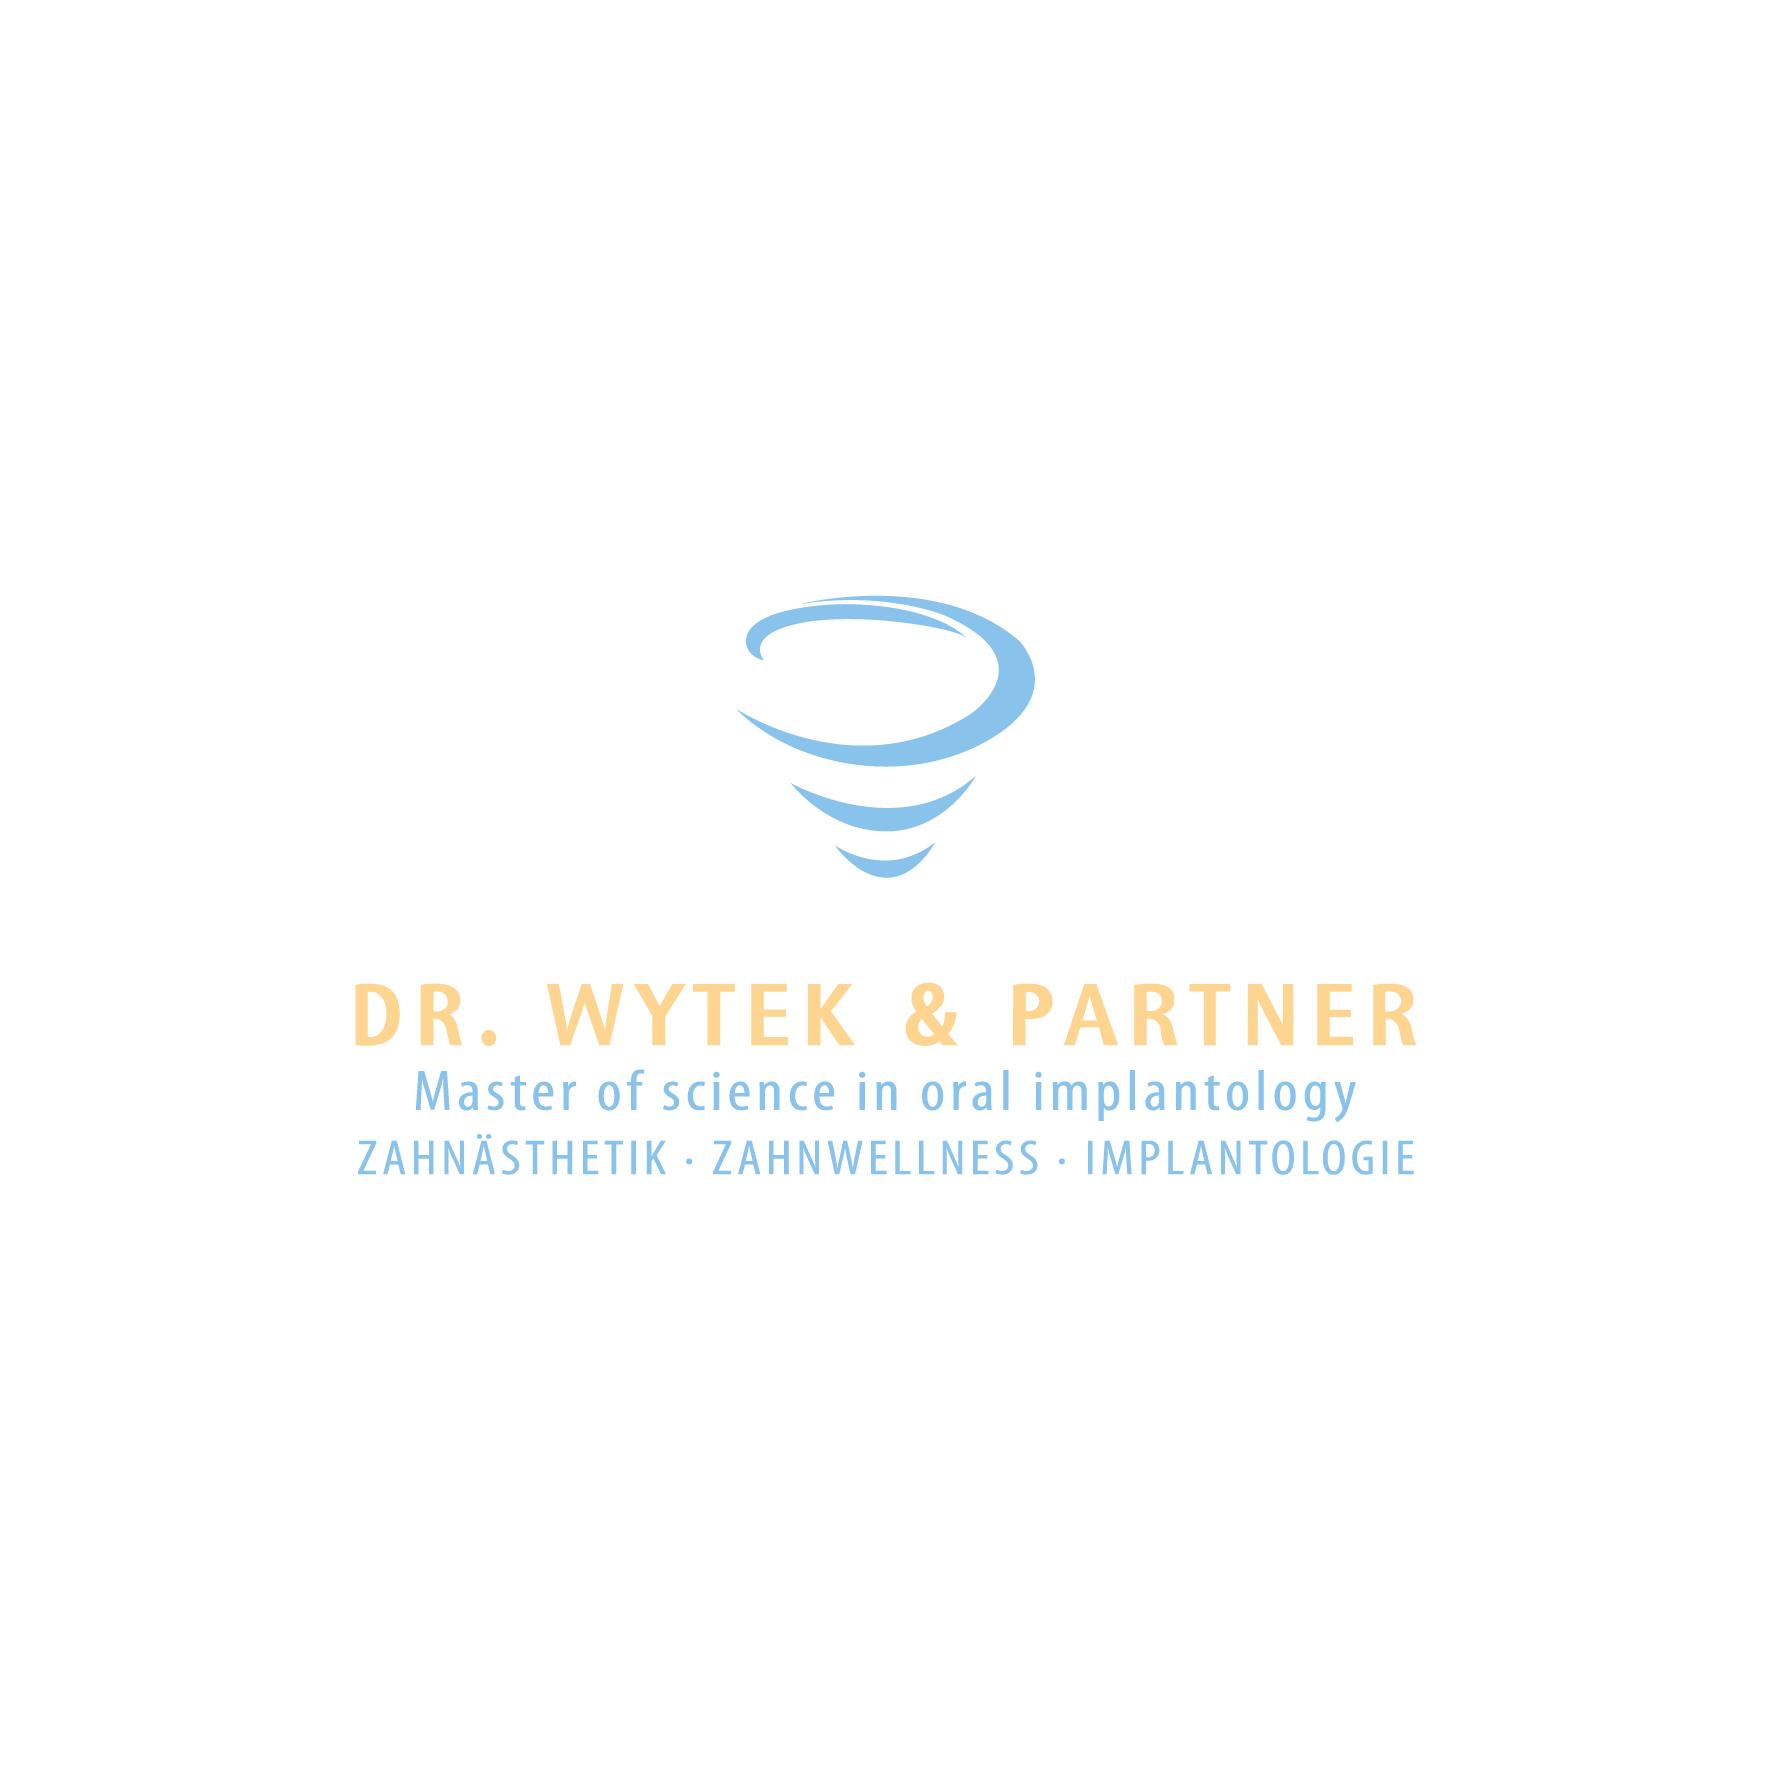 Praxis Dr. Wytek & Partner